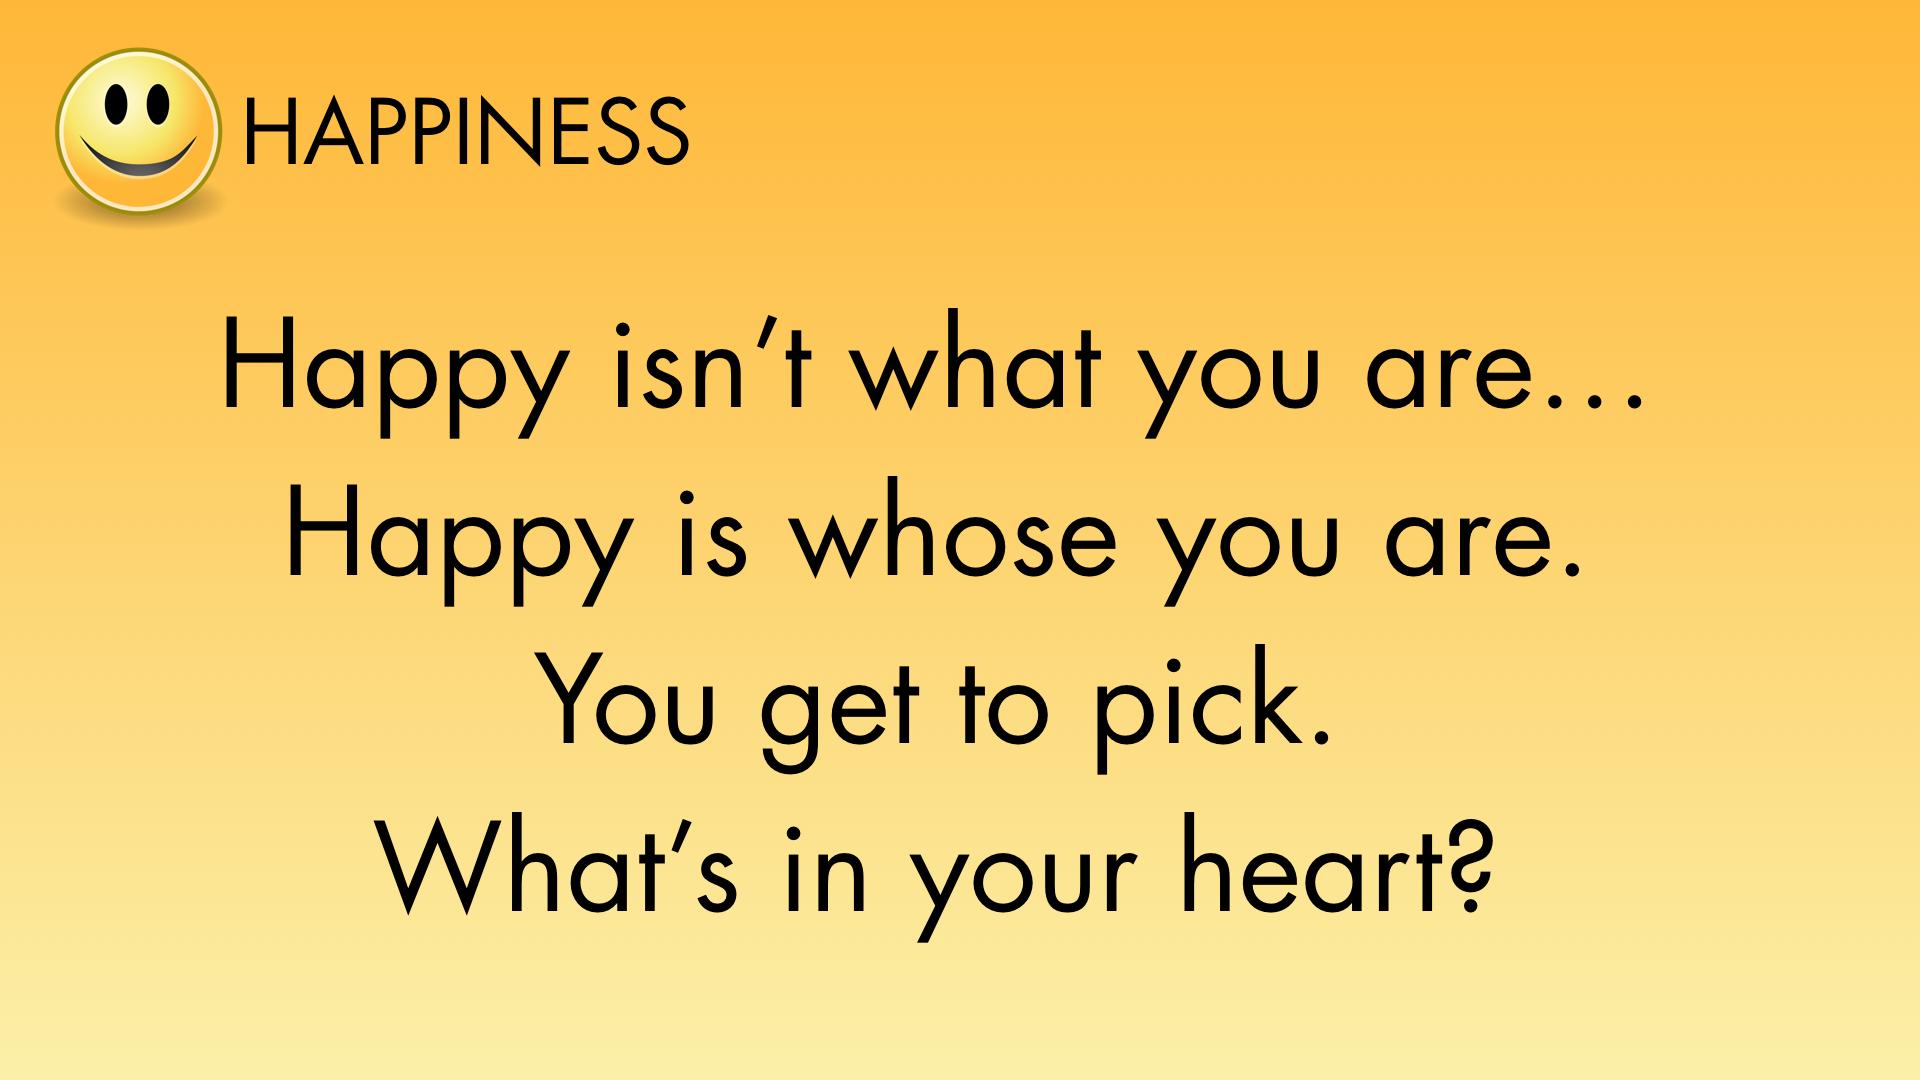 Happiness Aug 7 2016.013